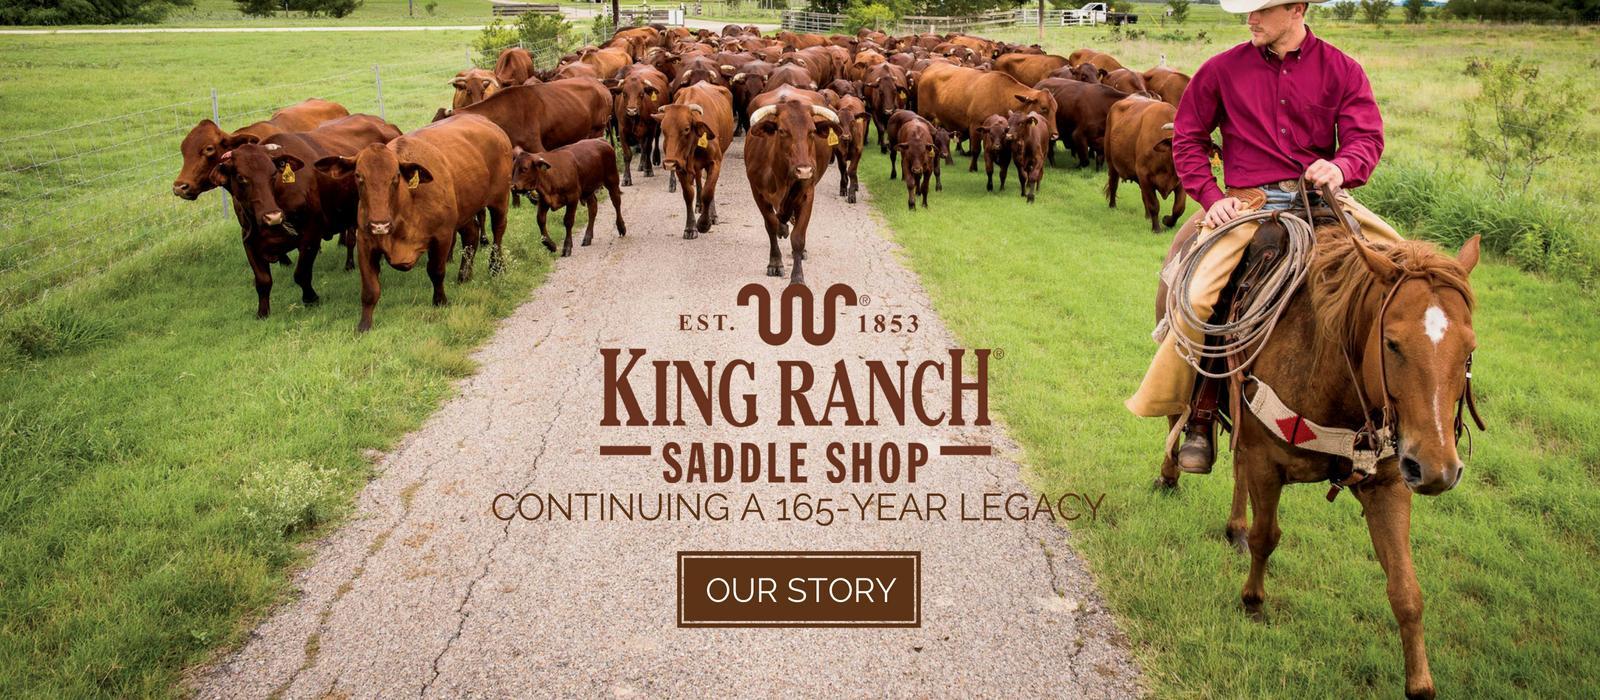 Saddles Boots Apparel Amp More King Ranch Saddle Shop